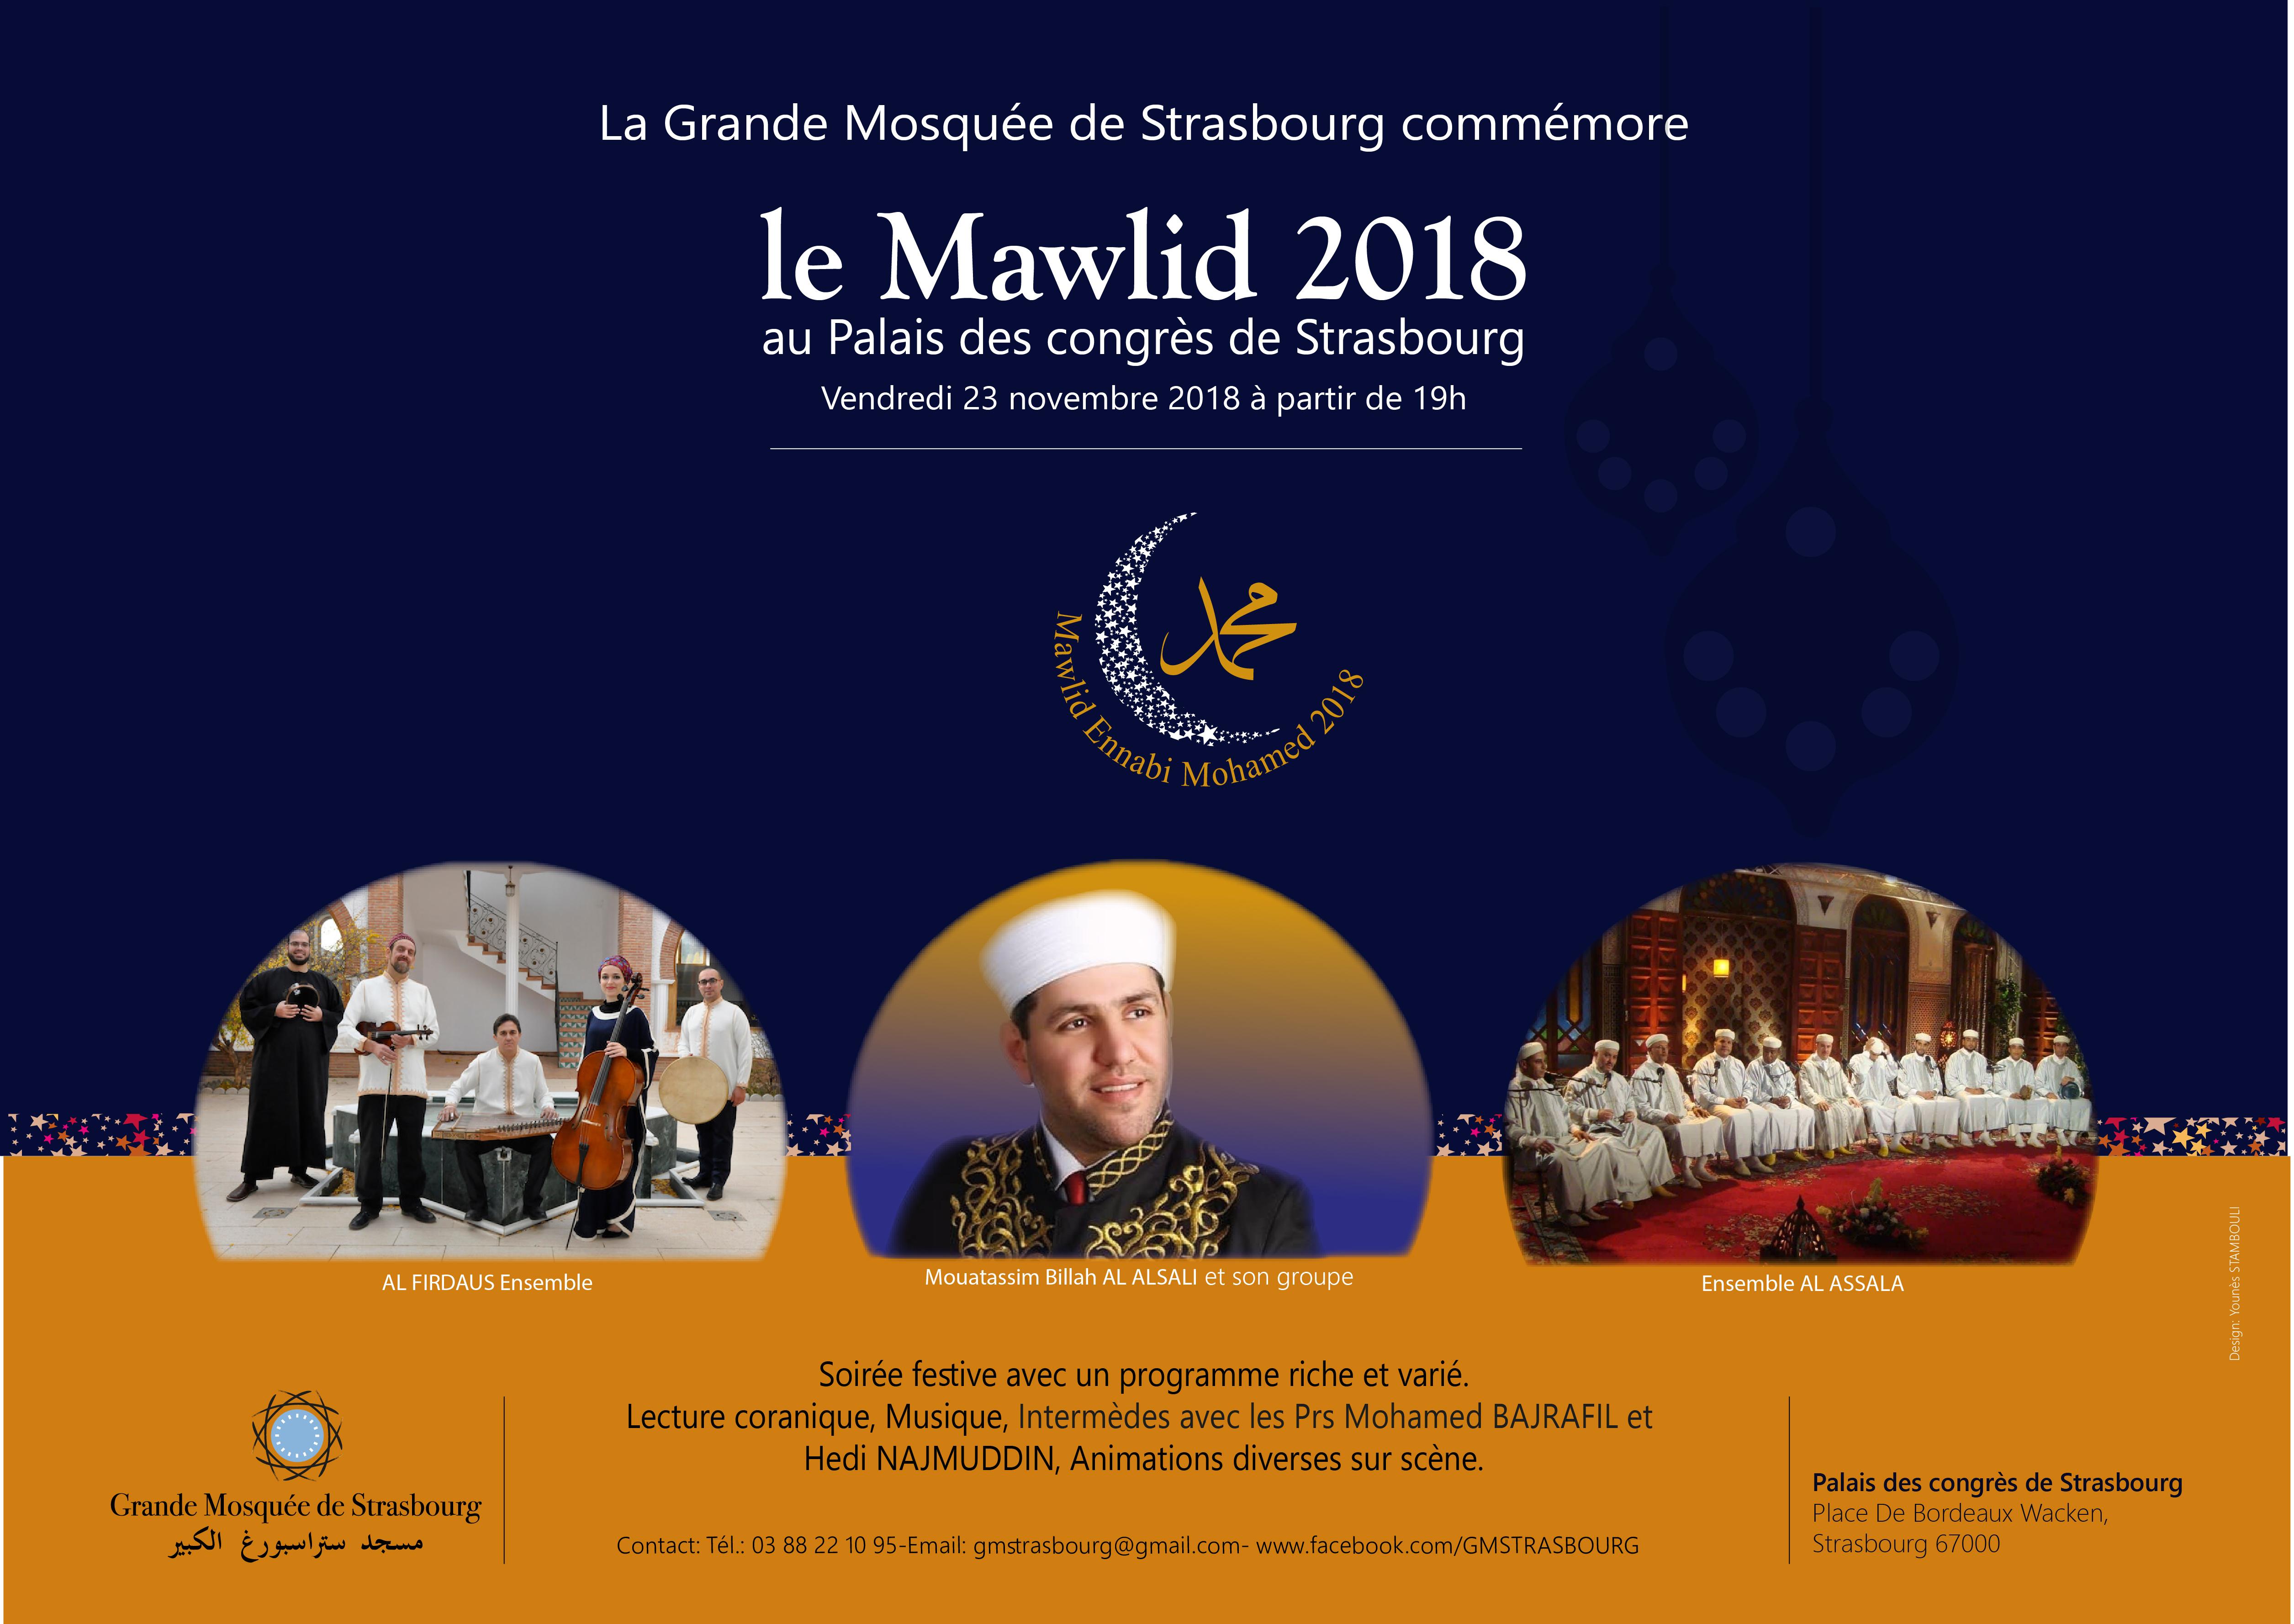 https://www.saphirnews.com/agenda/Mawlid-2018-au-Palais-de-la-Musique-et-des-Congres-de-Strasbourg_ae613286.html